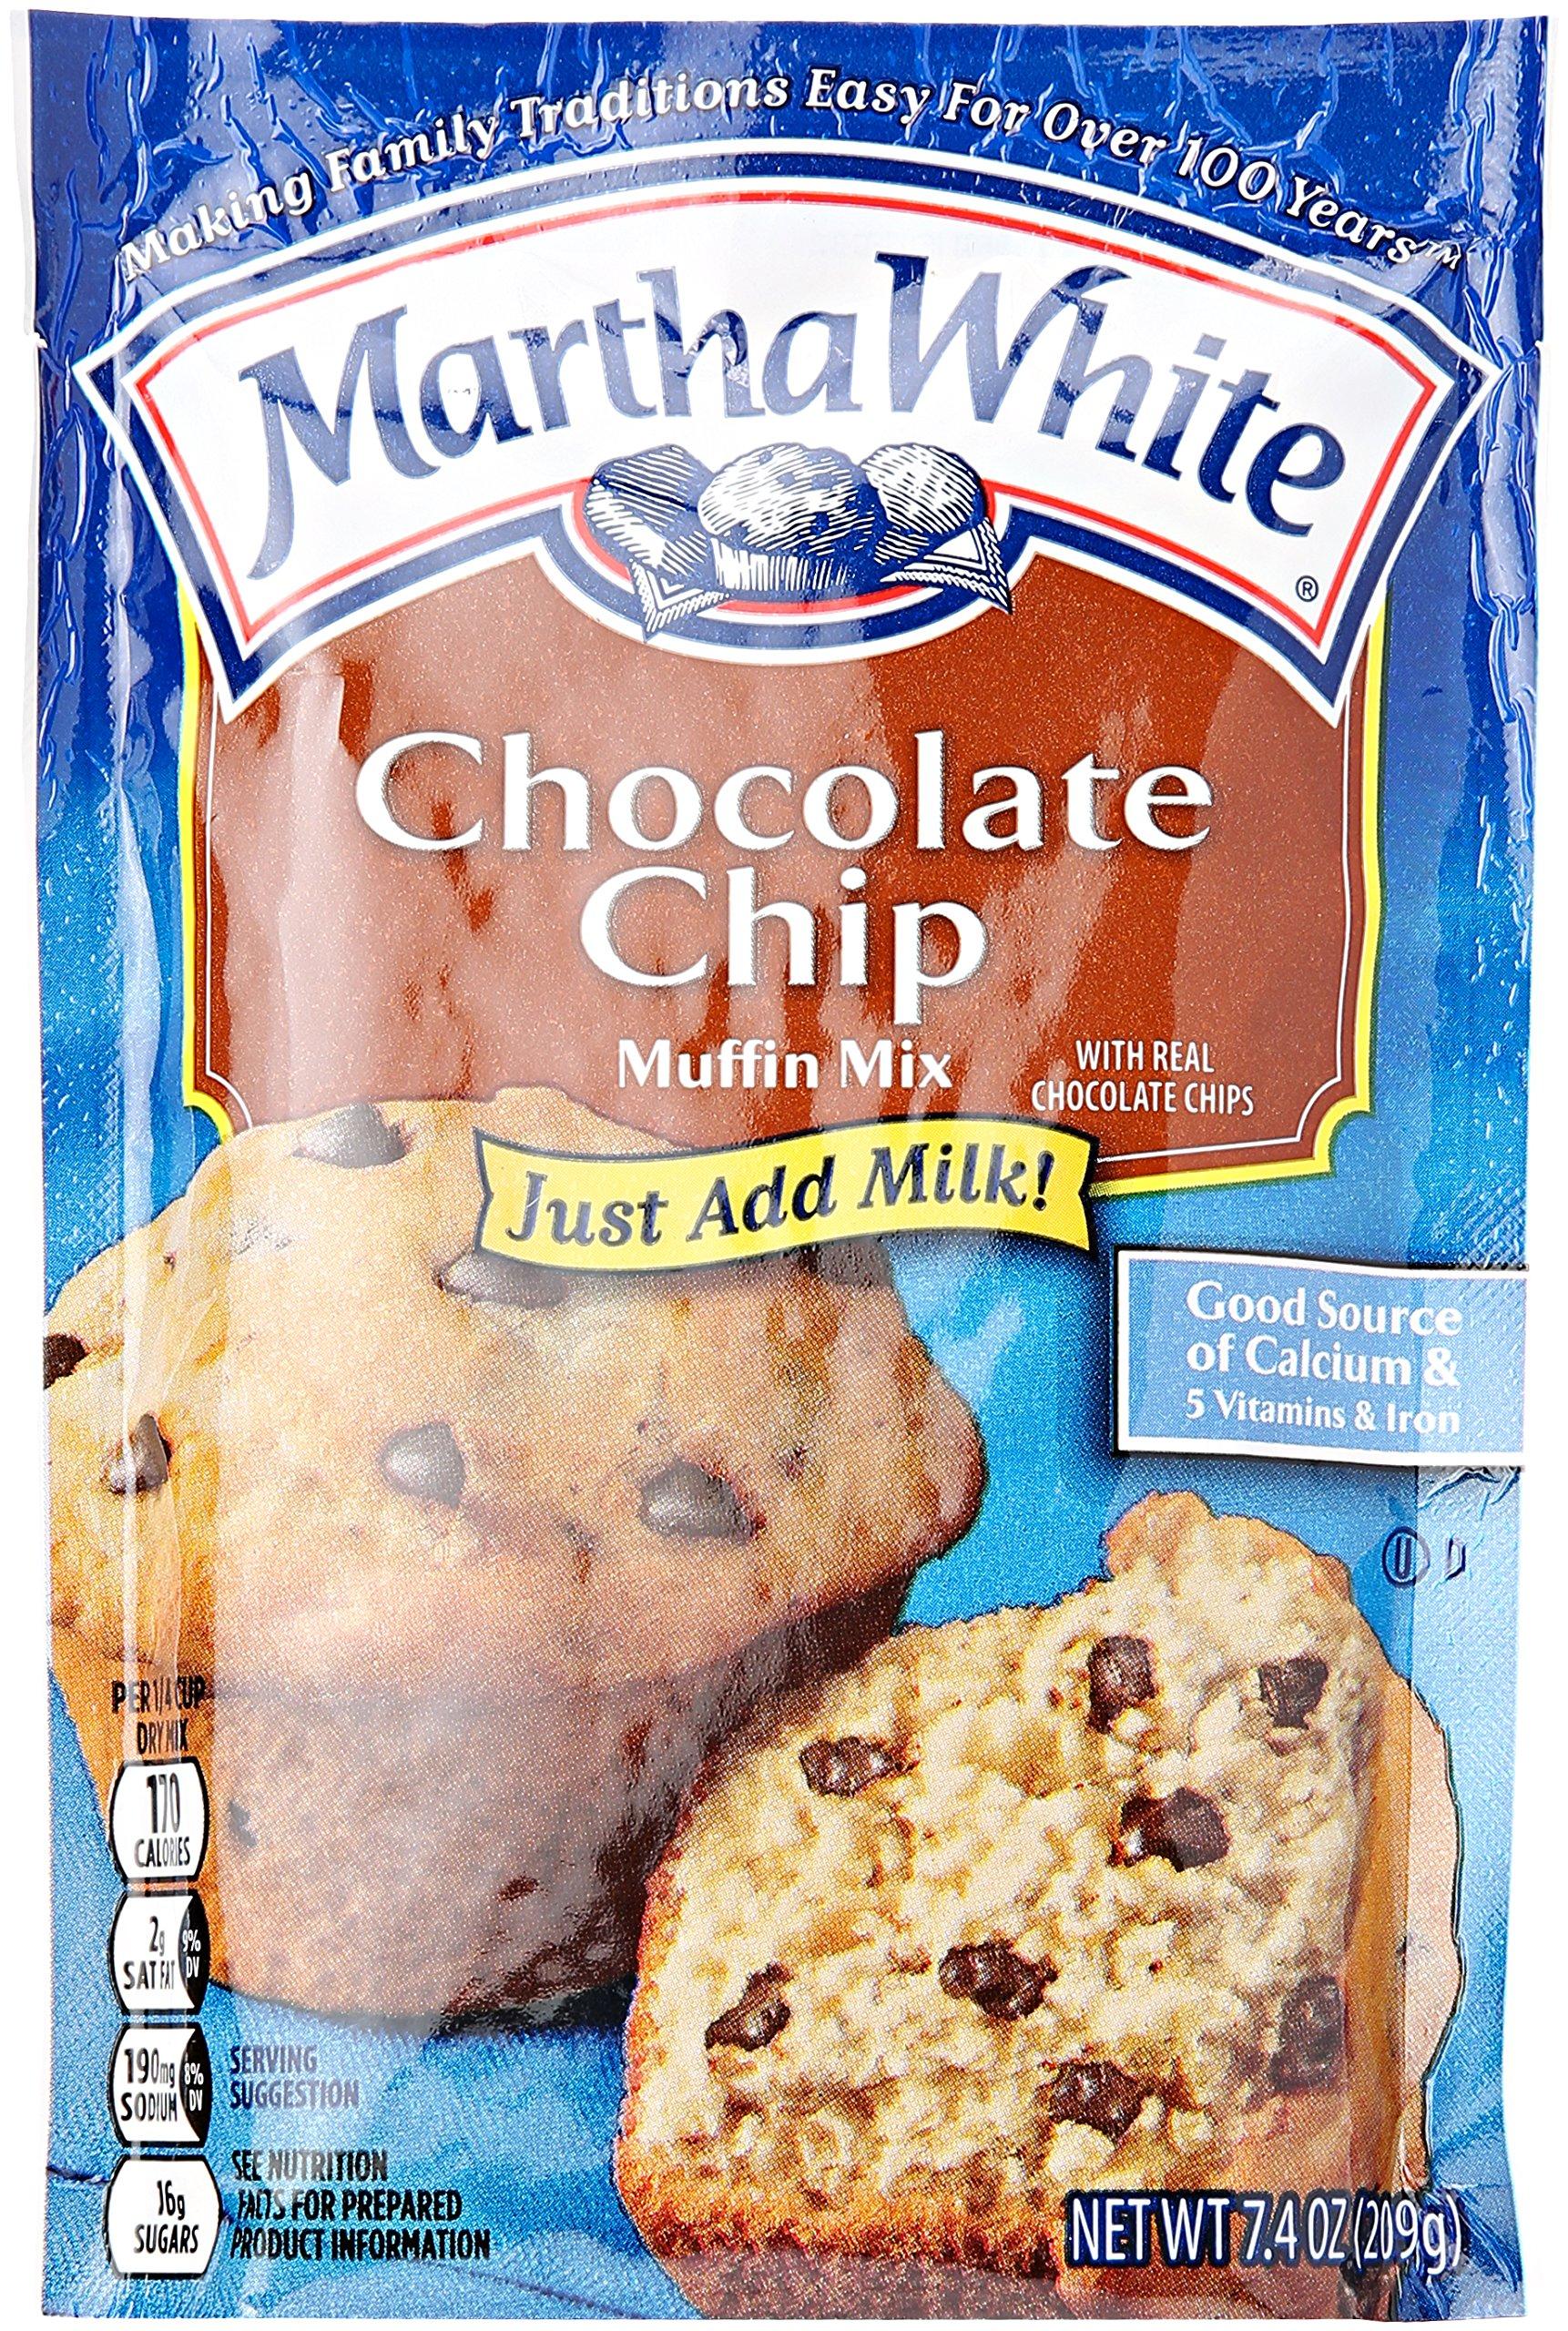 Smuckers Martha White Chocolate Chip Muffin Mix, 7.4 oz